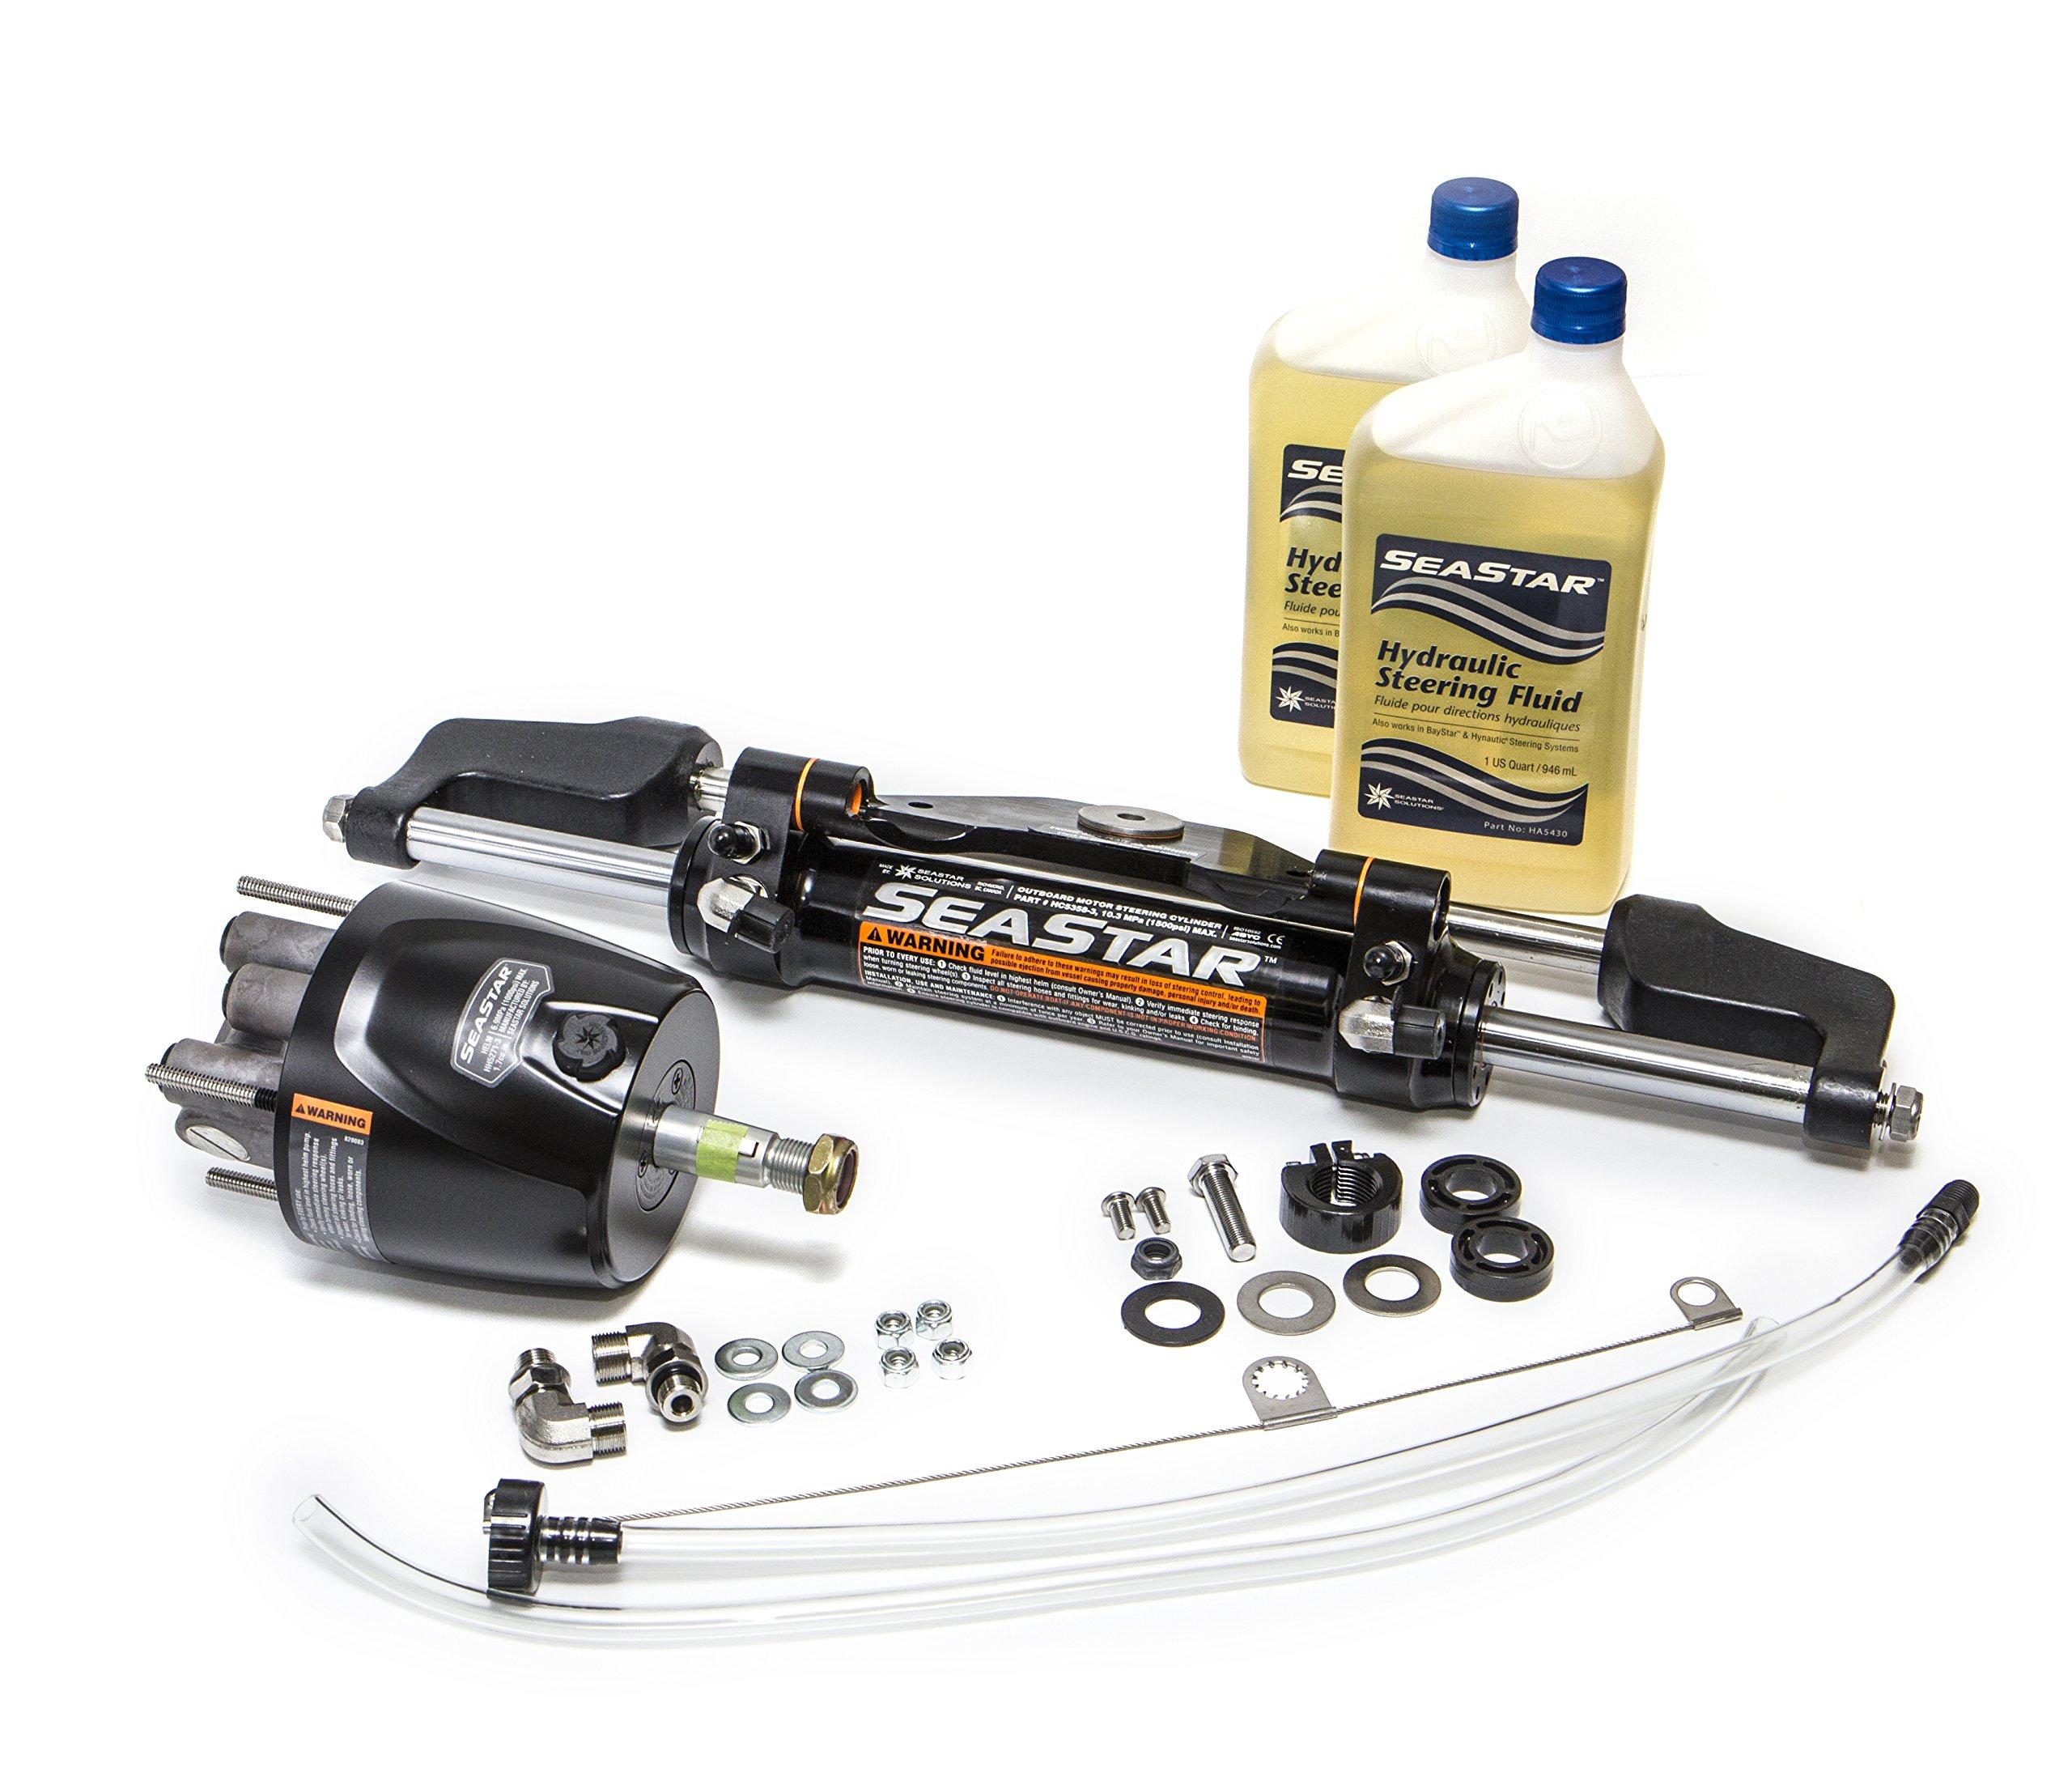 SeaStar HK6500Y-3 1.7 Yamaha Marine Hydraulic Steering Kit (Without Hoses) by SeaStar